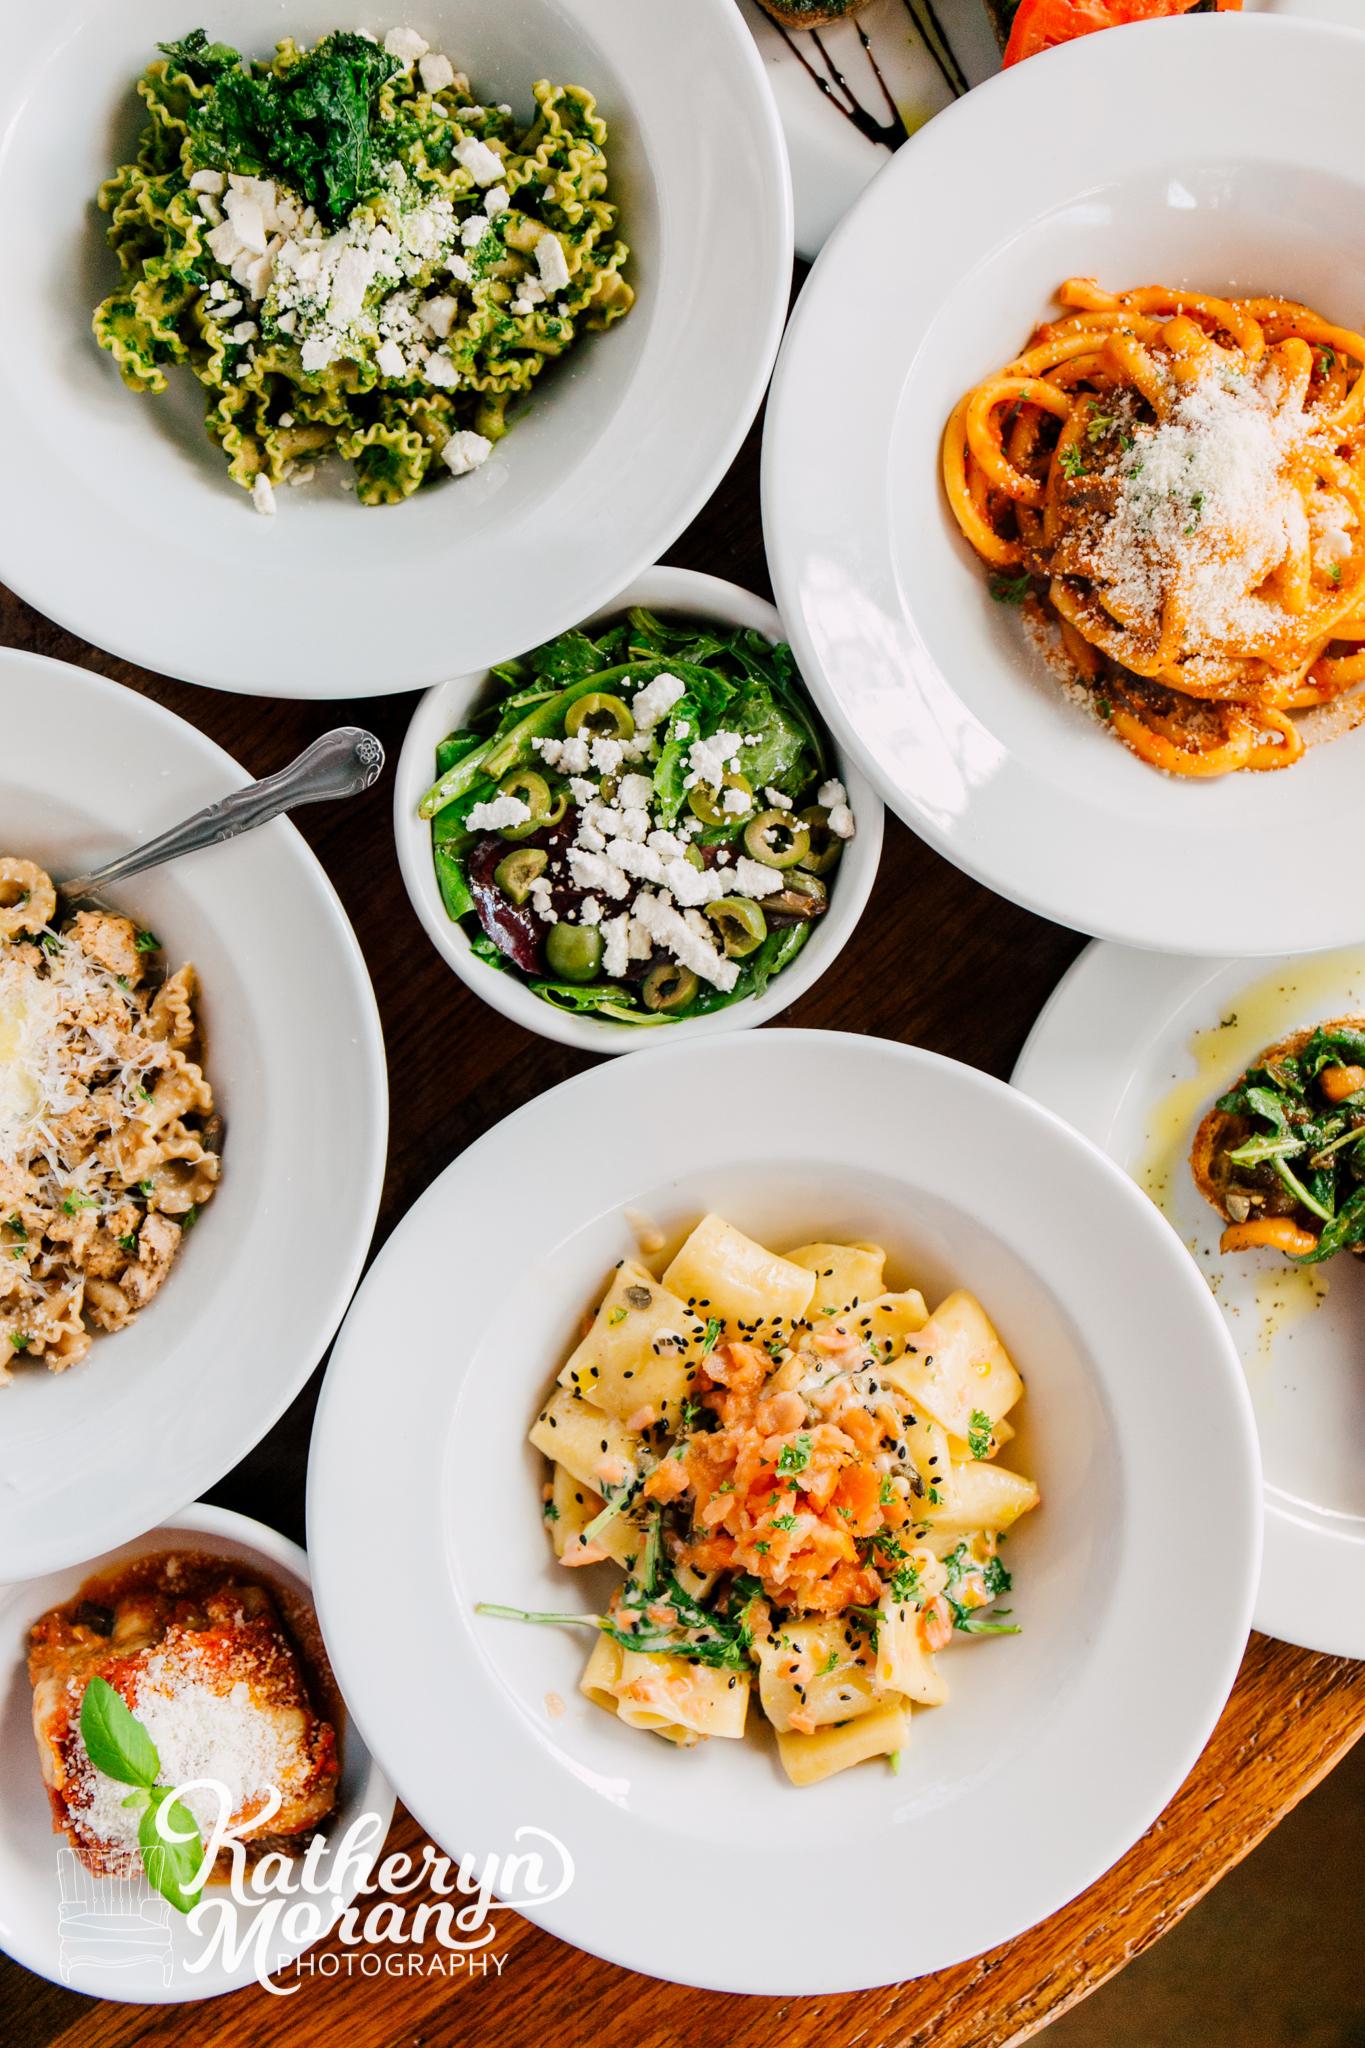 seattle-food-photographer-katheryn-moran-due-cucina-italiana-6.jpg